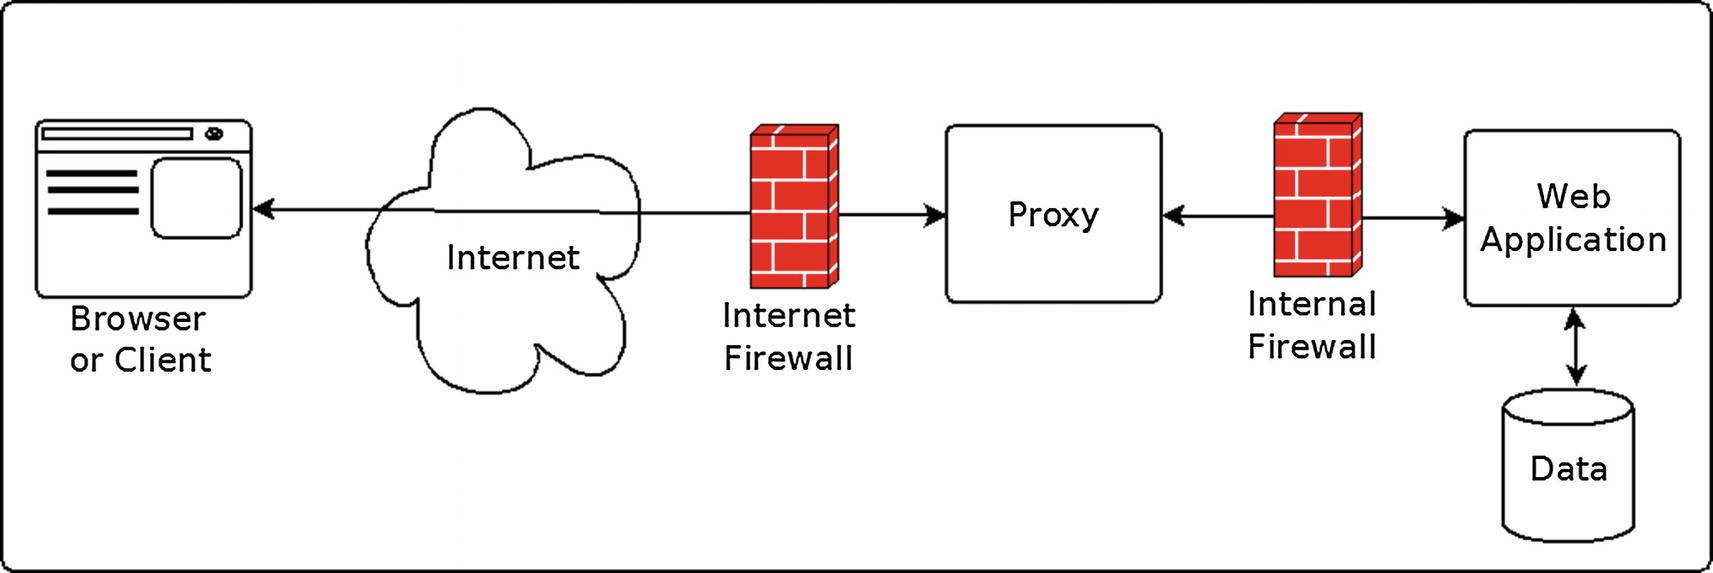 Proxy | SpringerLink